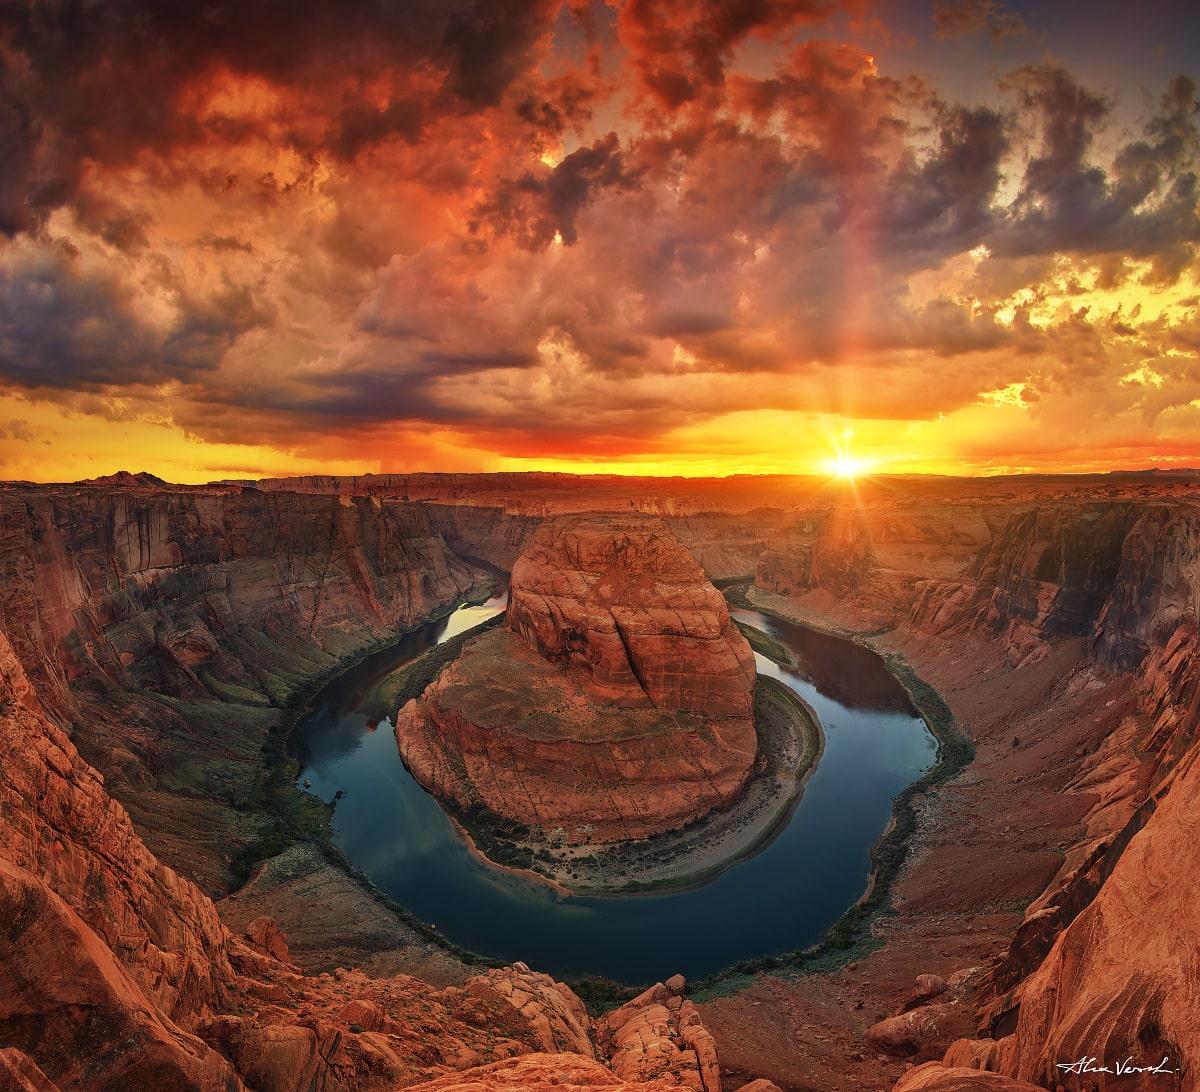 Horseshoe bend, colorado river, canyon, Arizona Photography, Alexander Vershinin, Limited edition, Fine Art, flying fire, photo